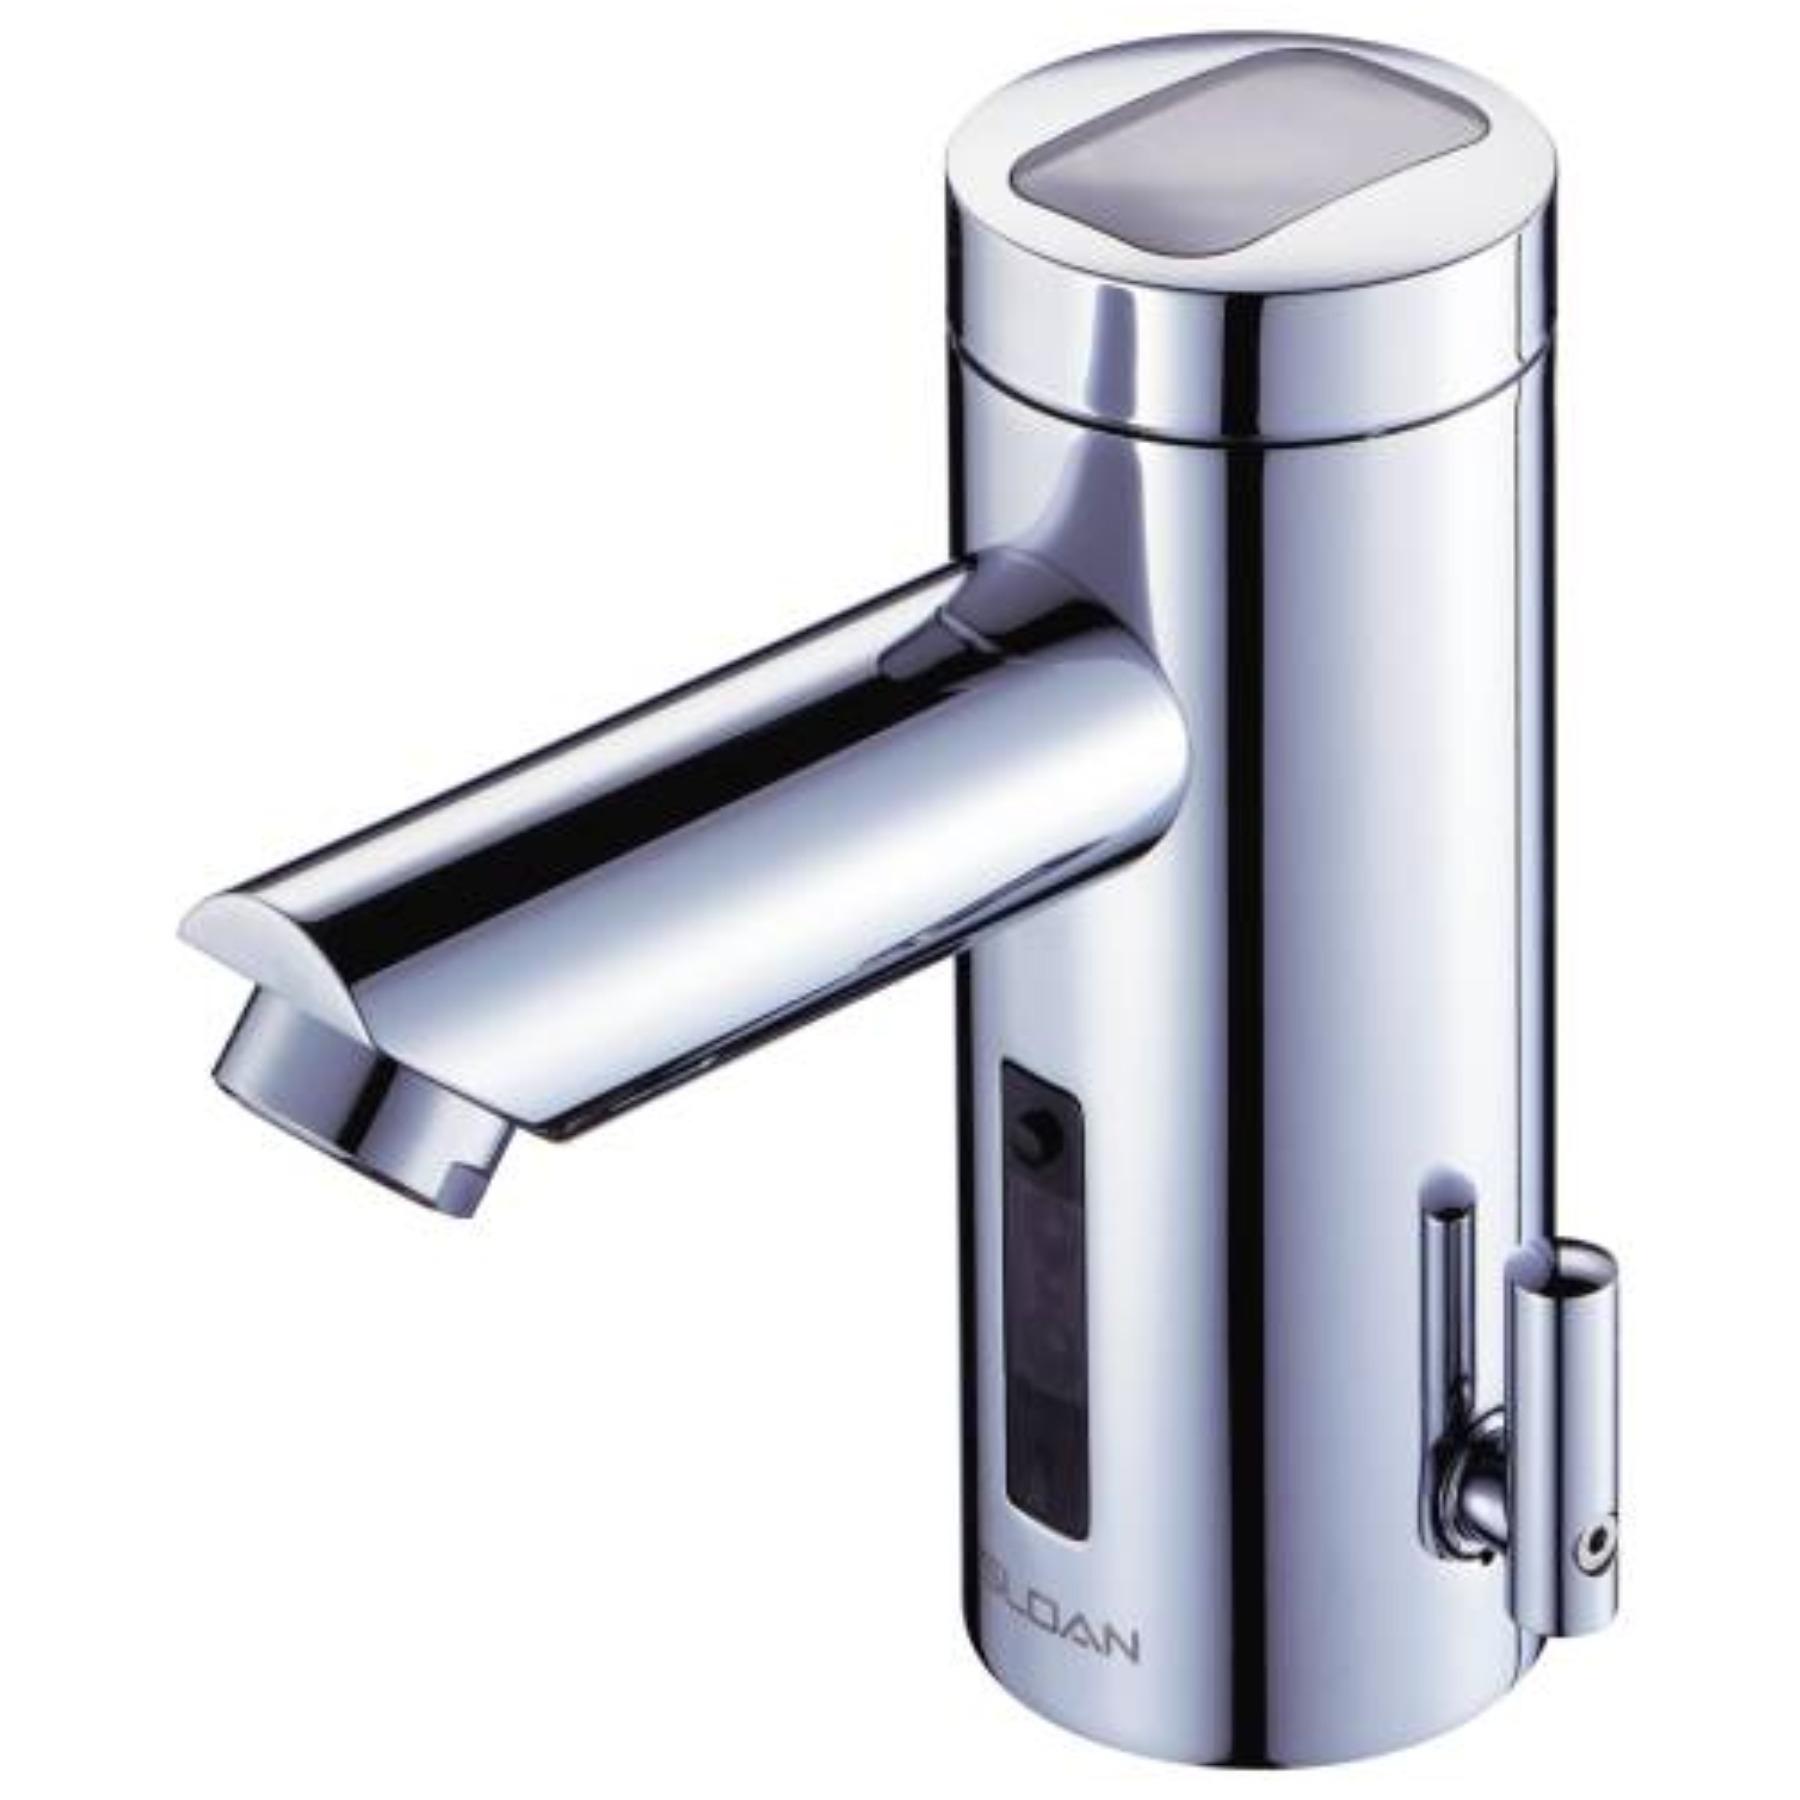 Ideas, sloan faucets battery operated sloan faucets battery operated sloan valve company products 1800 x 1800  .